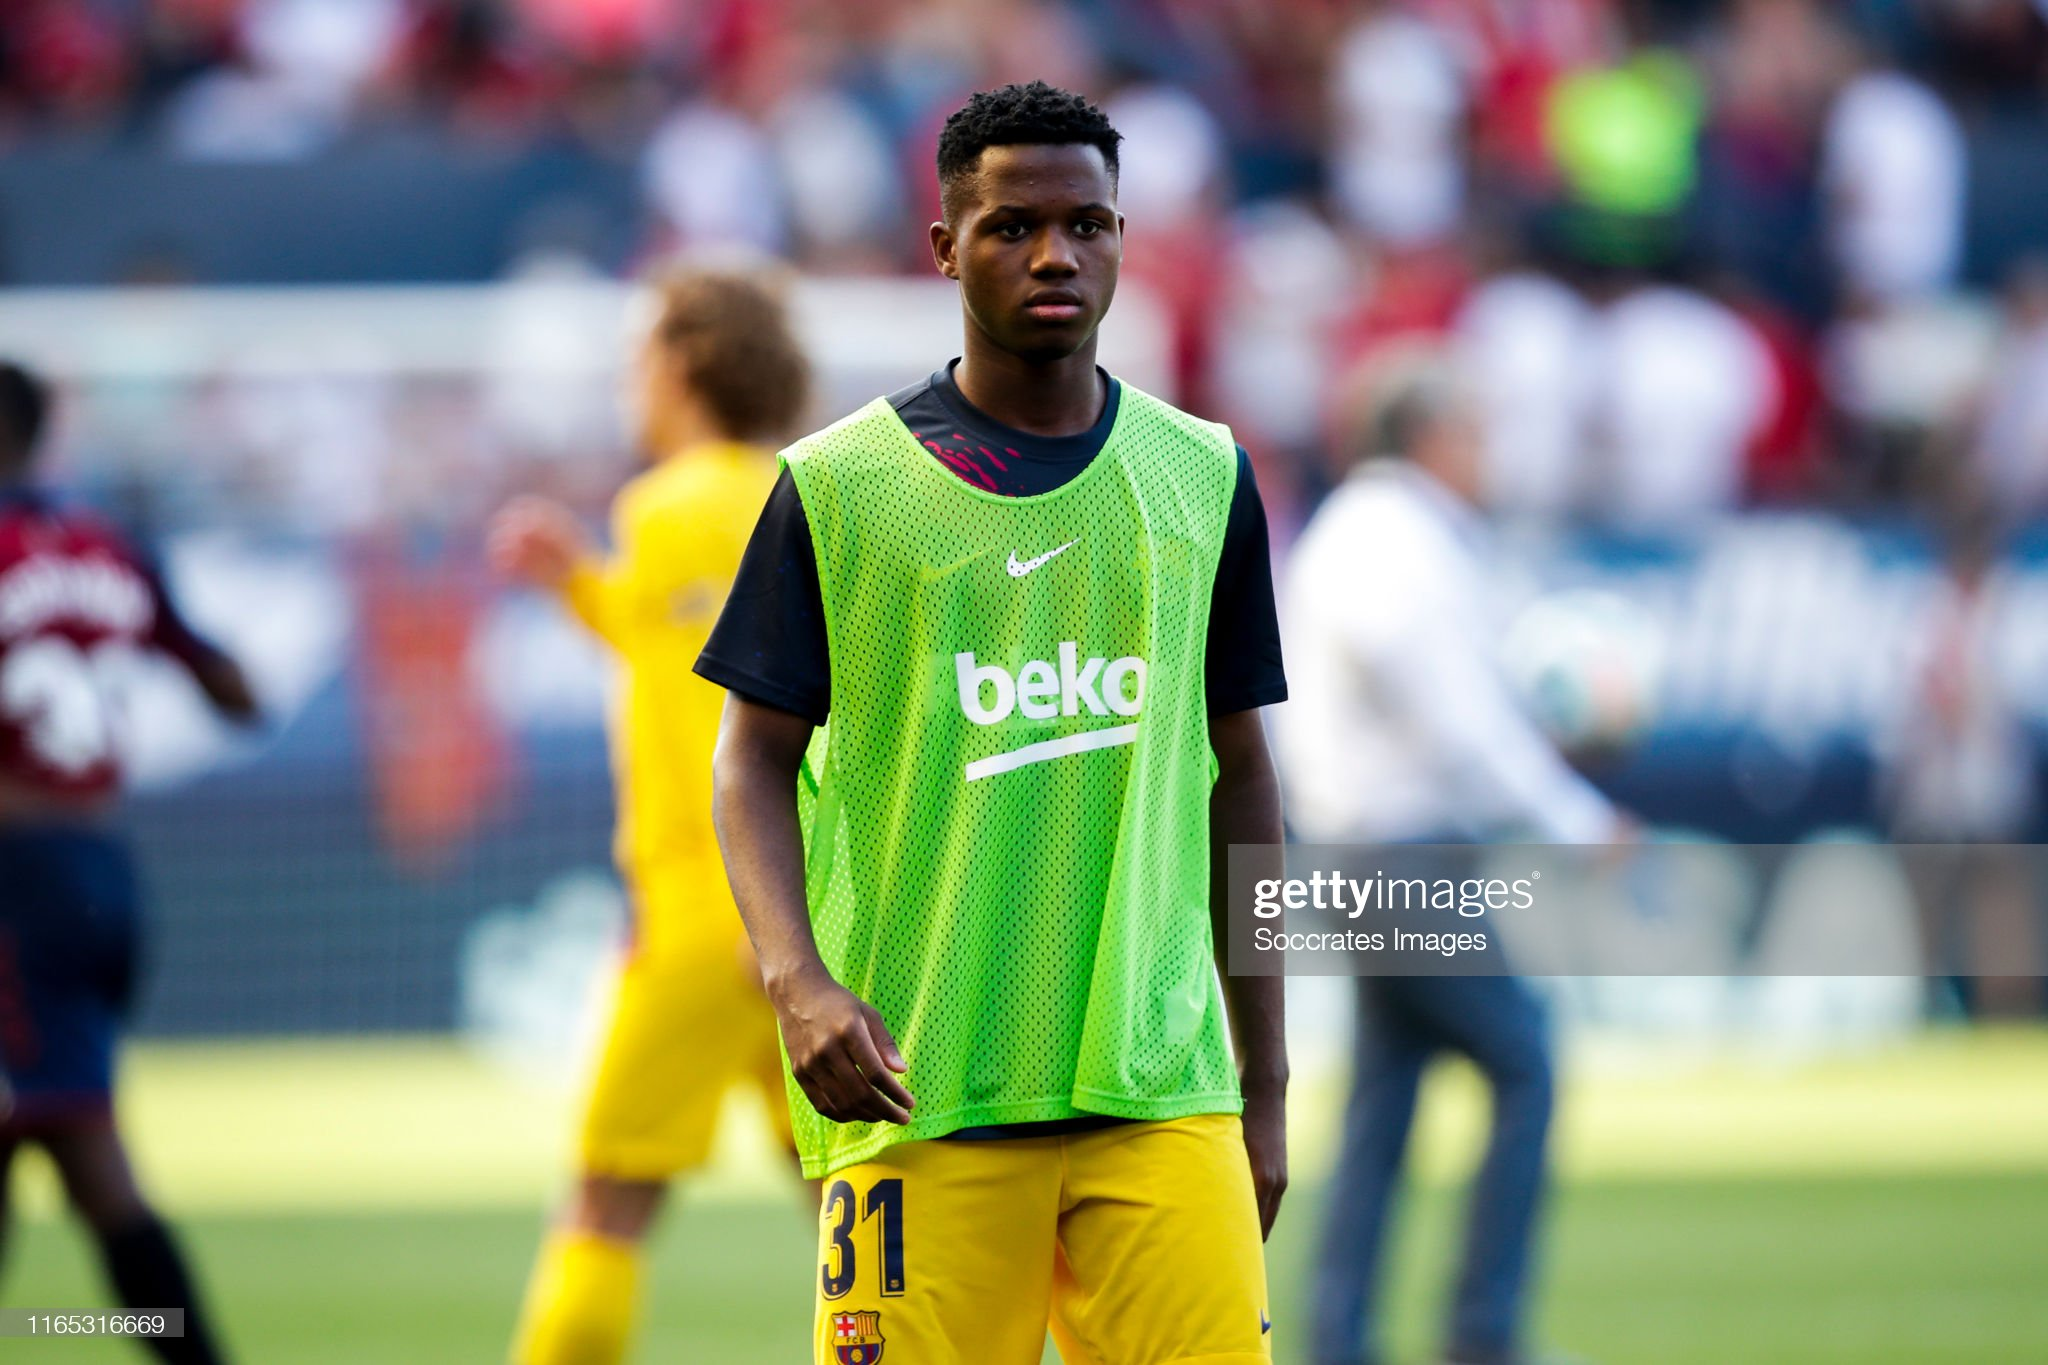 صور مباراة : أوساسونا - برشلونة 2-2 ( 31-08-2019 )  Ansu-fati-of-fc-barcelona-during-the-la-liga-santander-match-between-picture-id1165316669?s=2048x2048